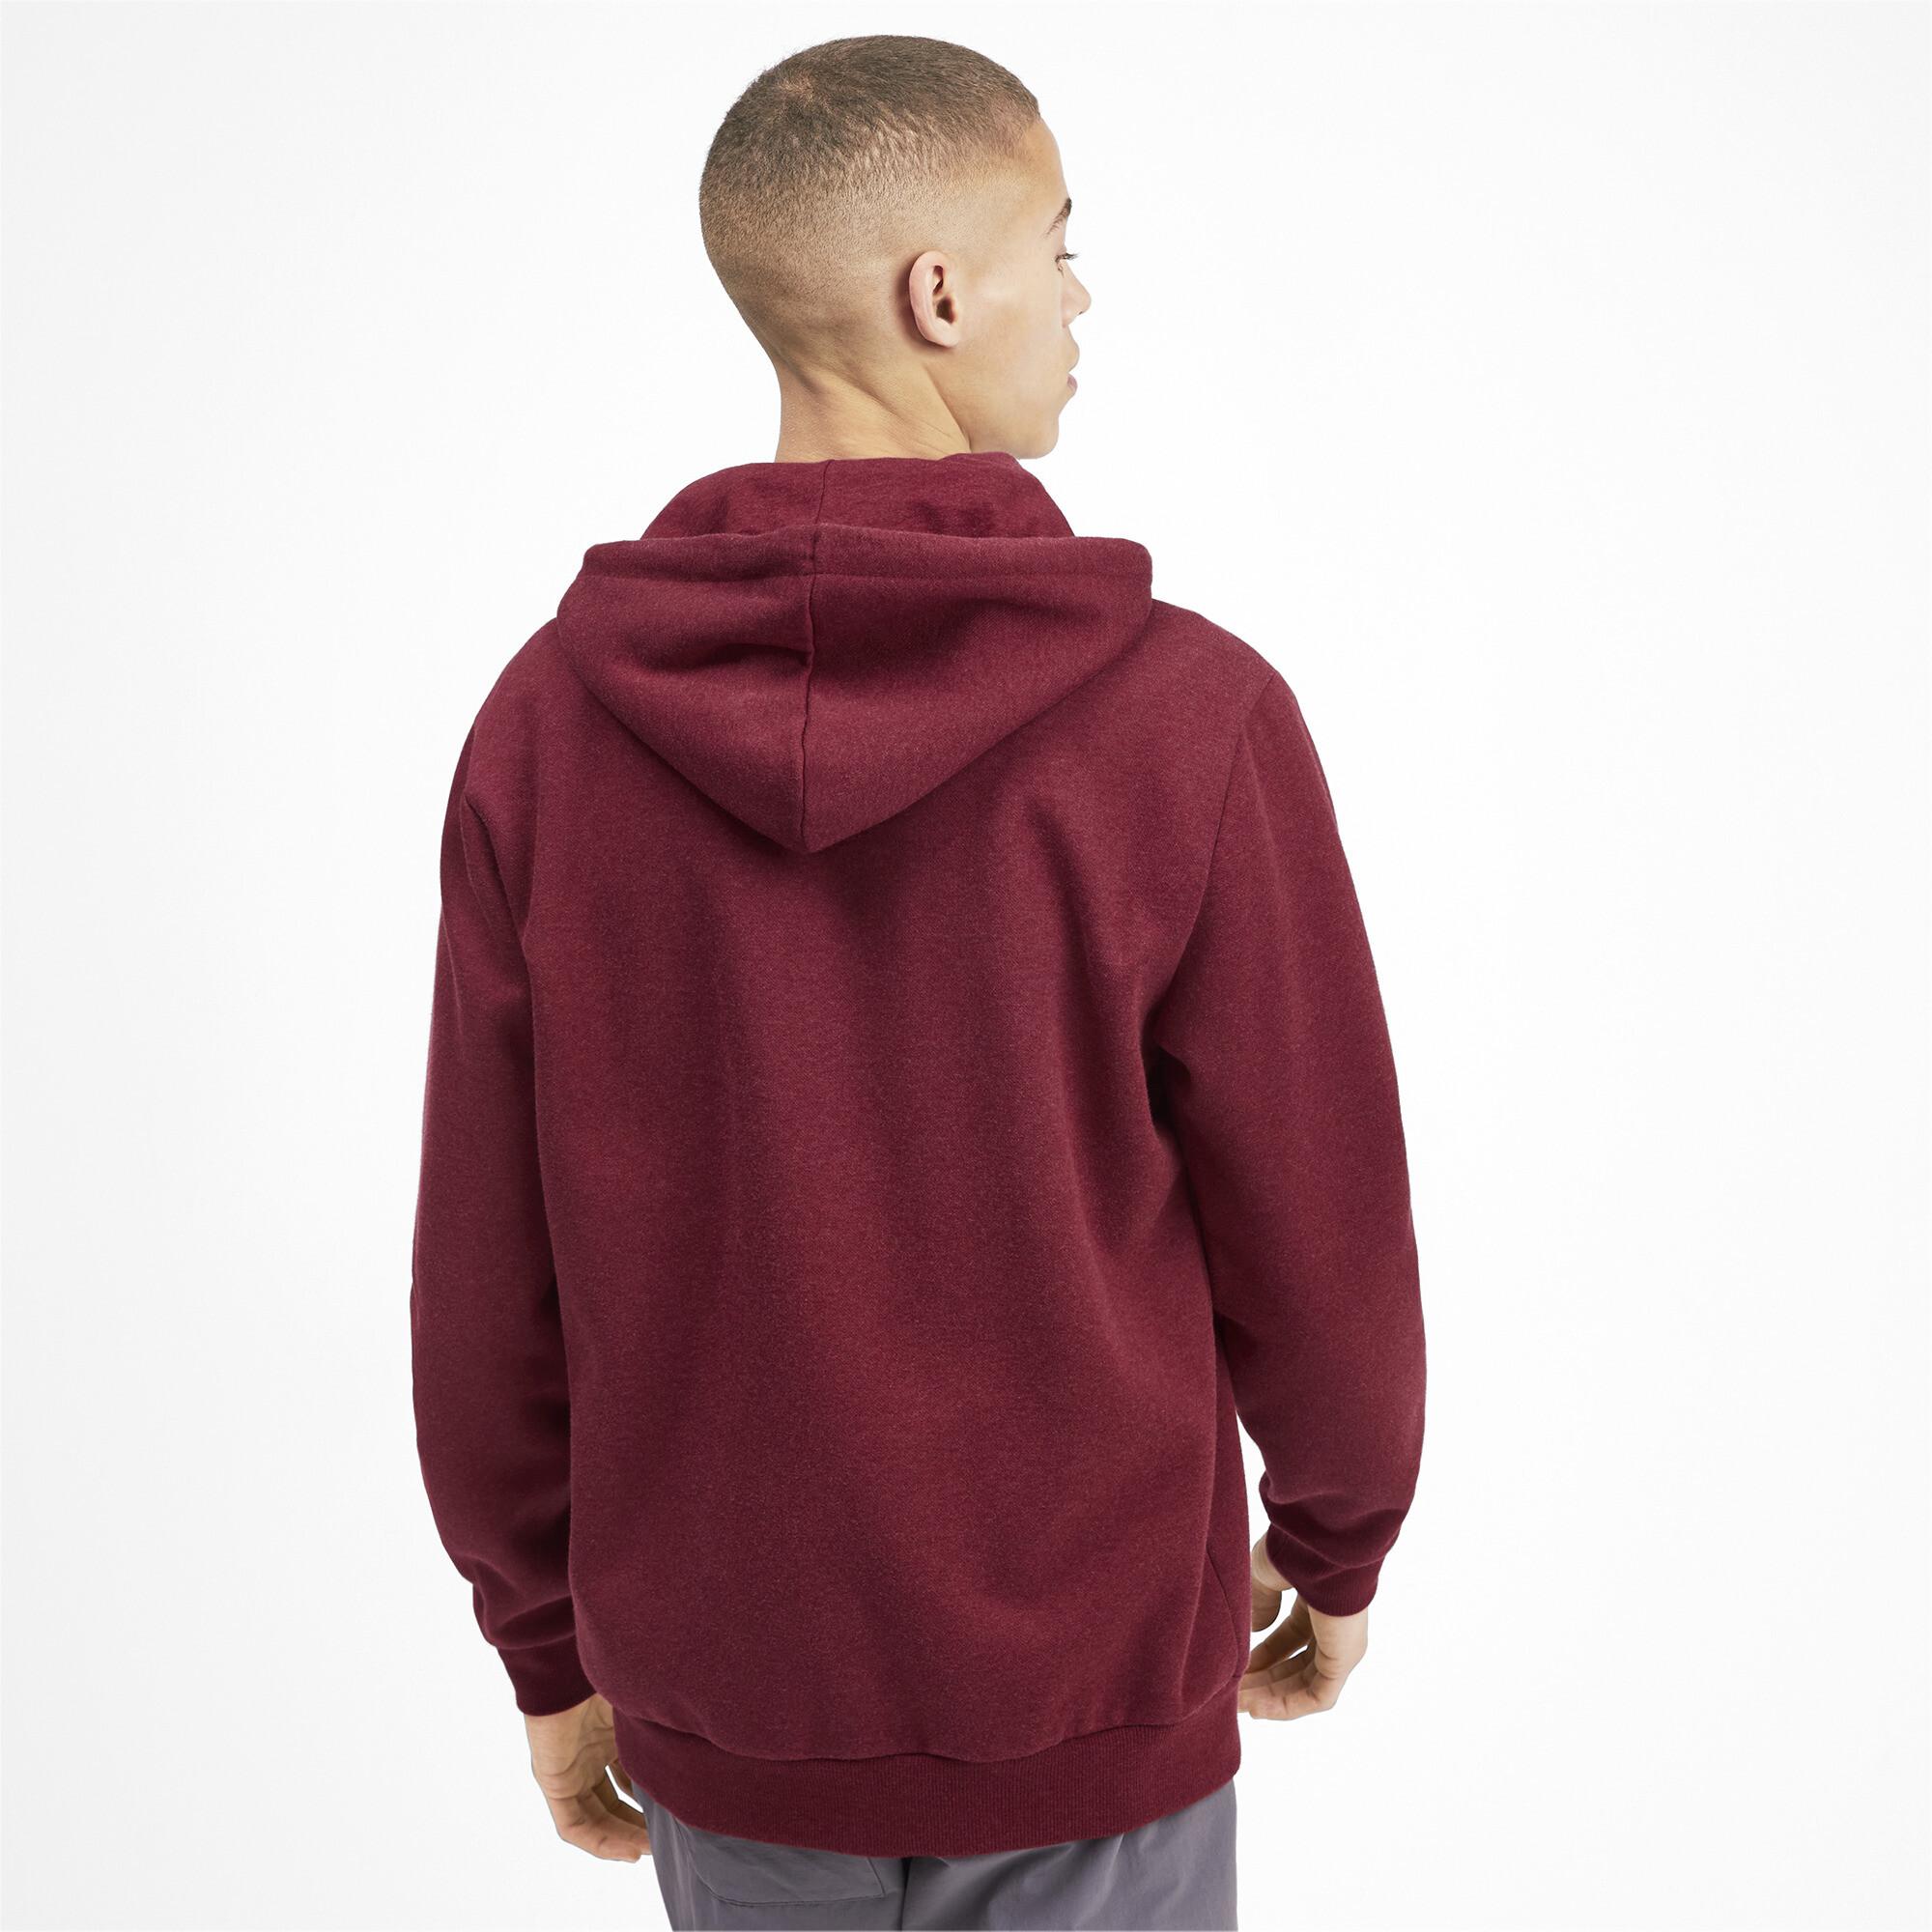 PUMA-Essentials-Men-039-s-Fleece-Hooded-Jacket-Men-Sweat-Basics thumbnail 9